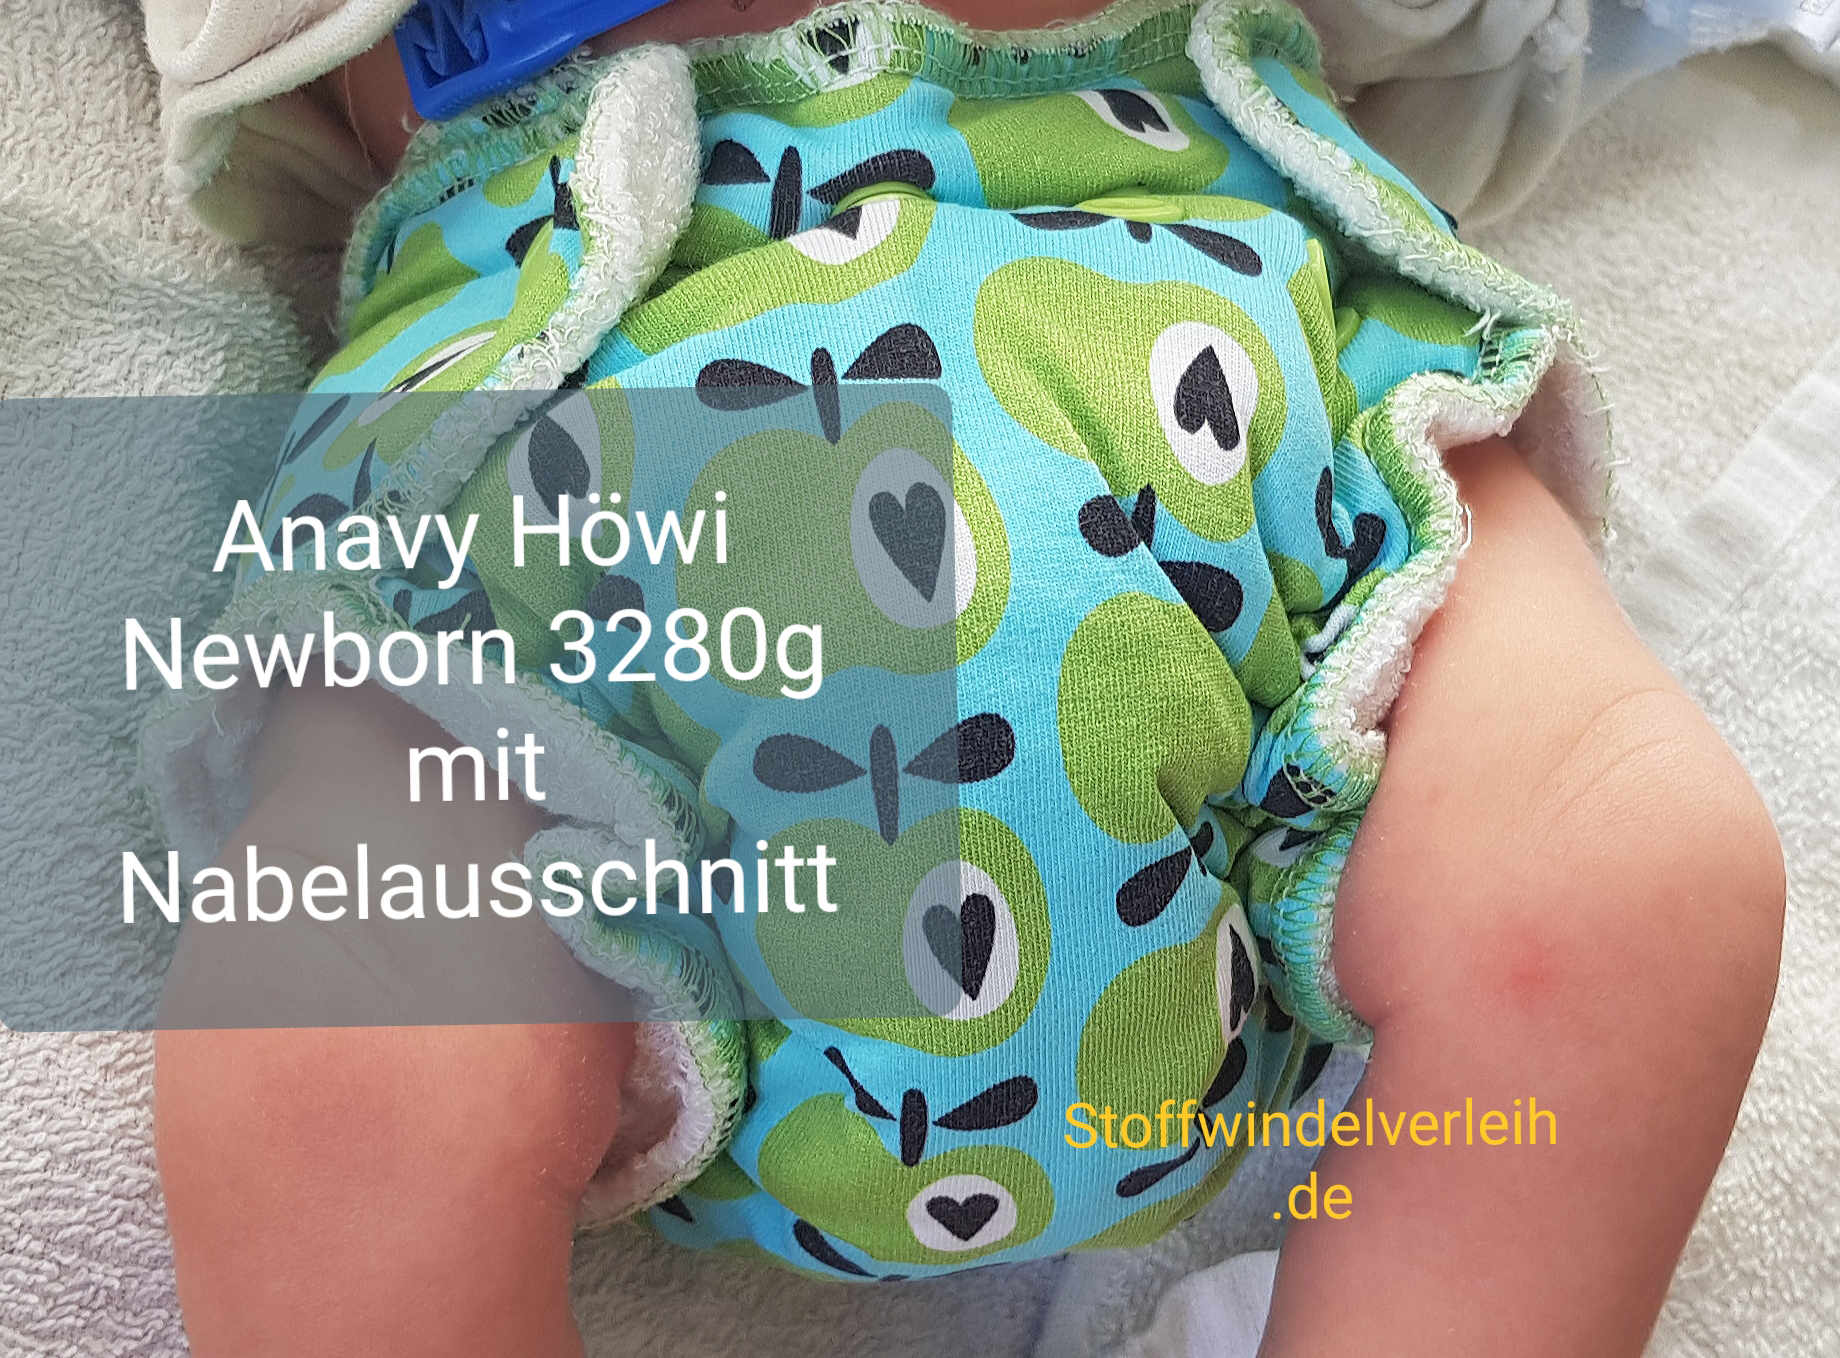 Anavy Höwi